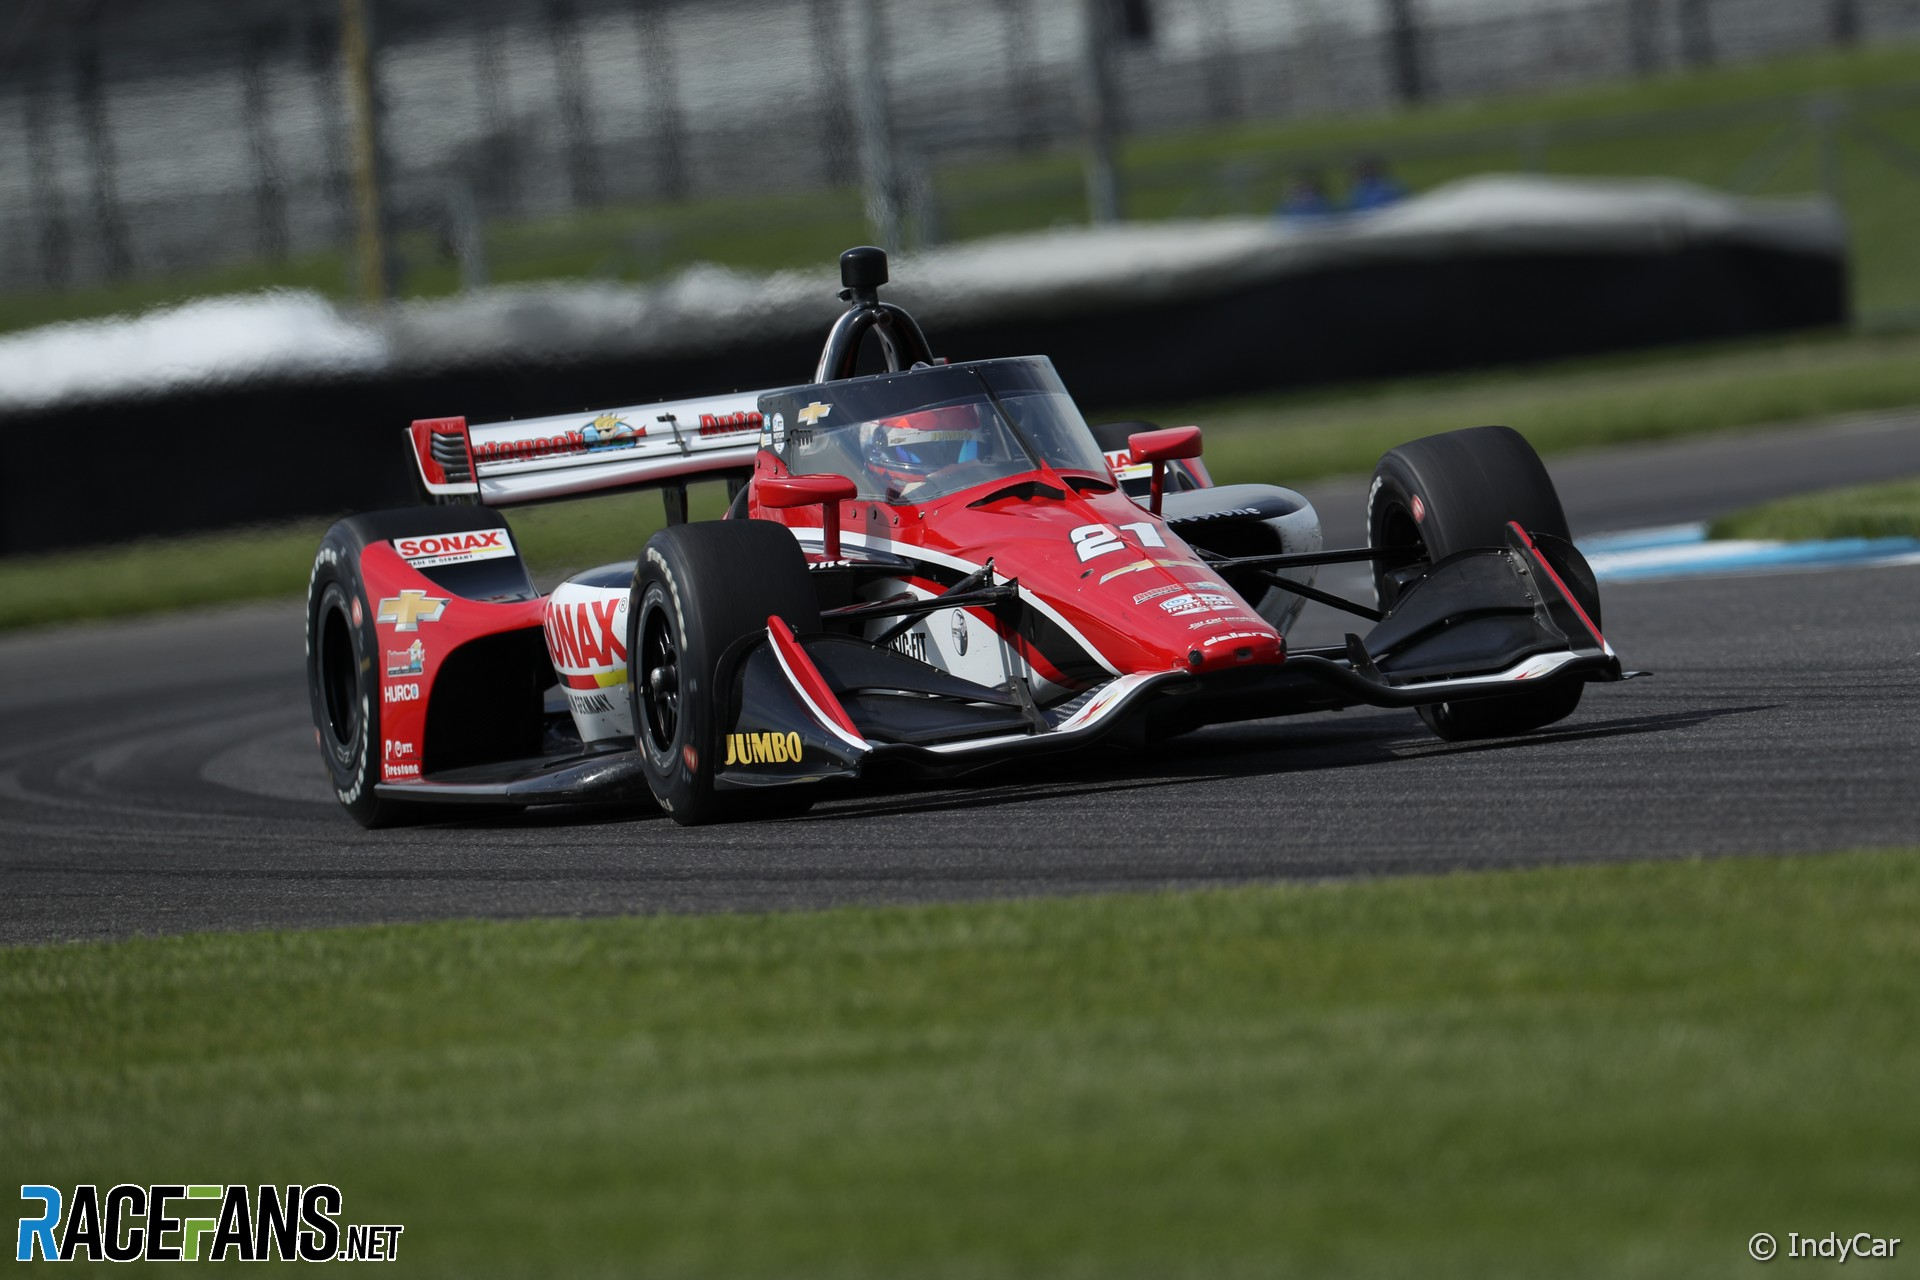 Rinus Veekay, Carpenter, IndyCar, Indianapolis Motor Speedway, 2021